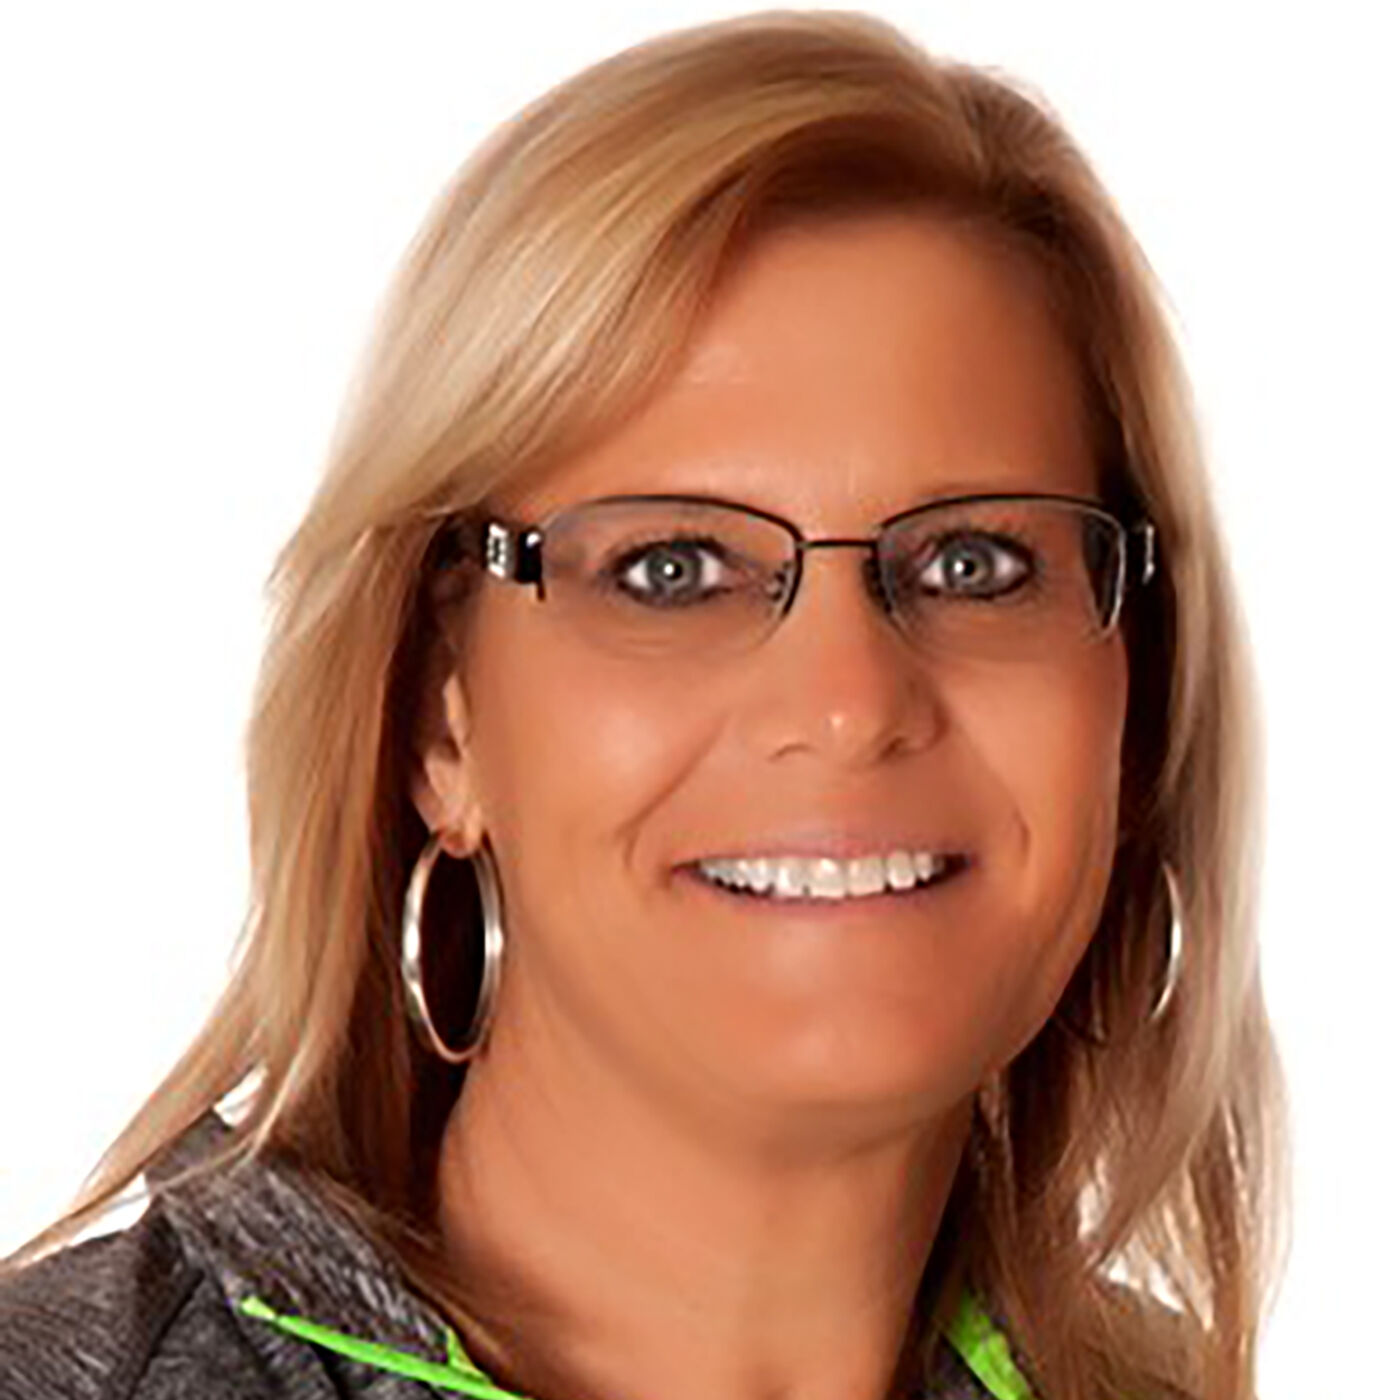 No Phones, New Friends Friday - Positive School Culture   Principal Janet Behrens